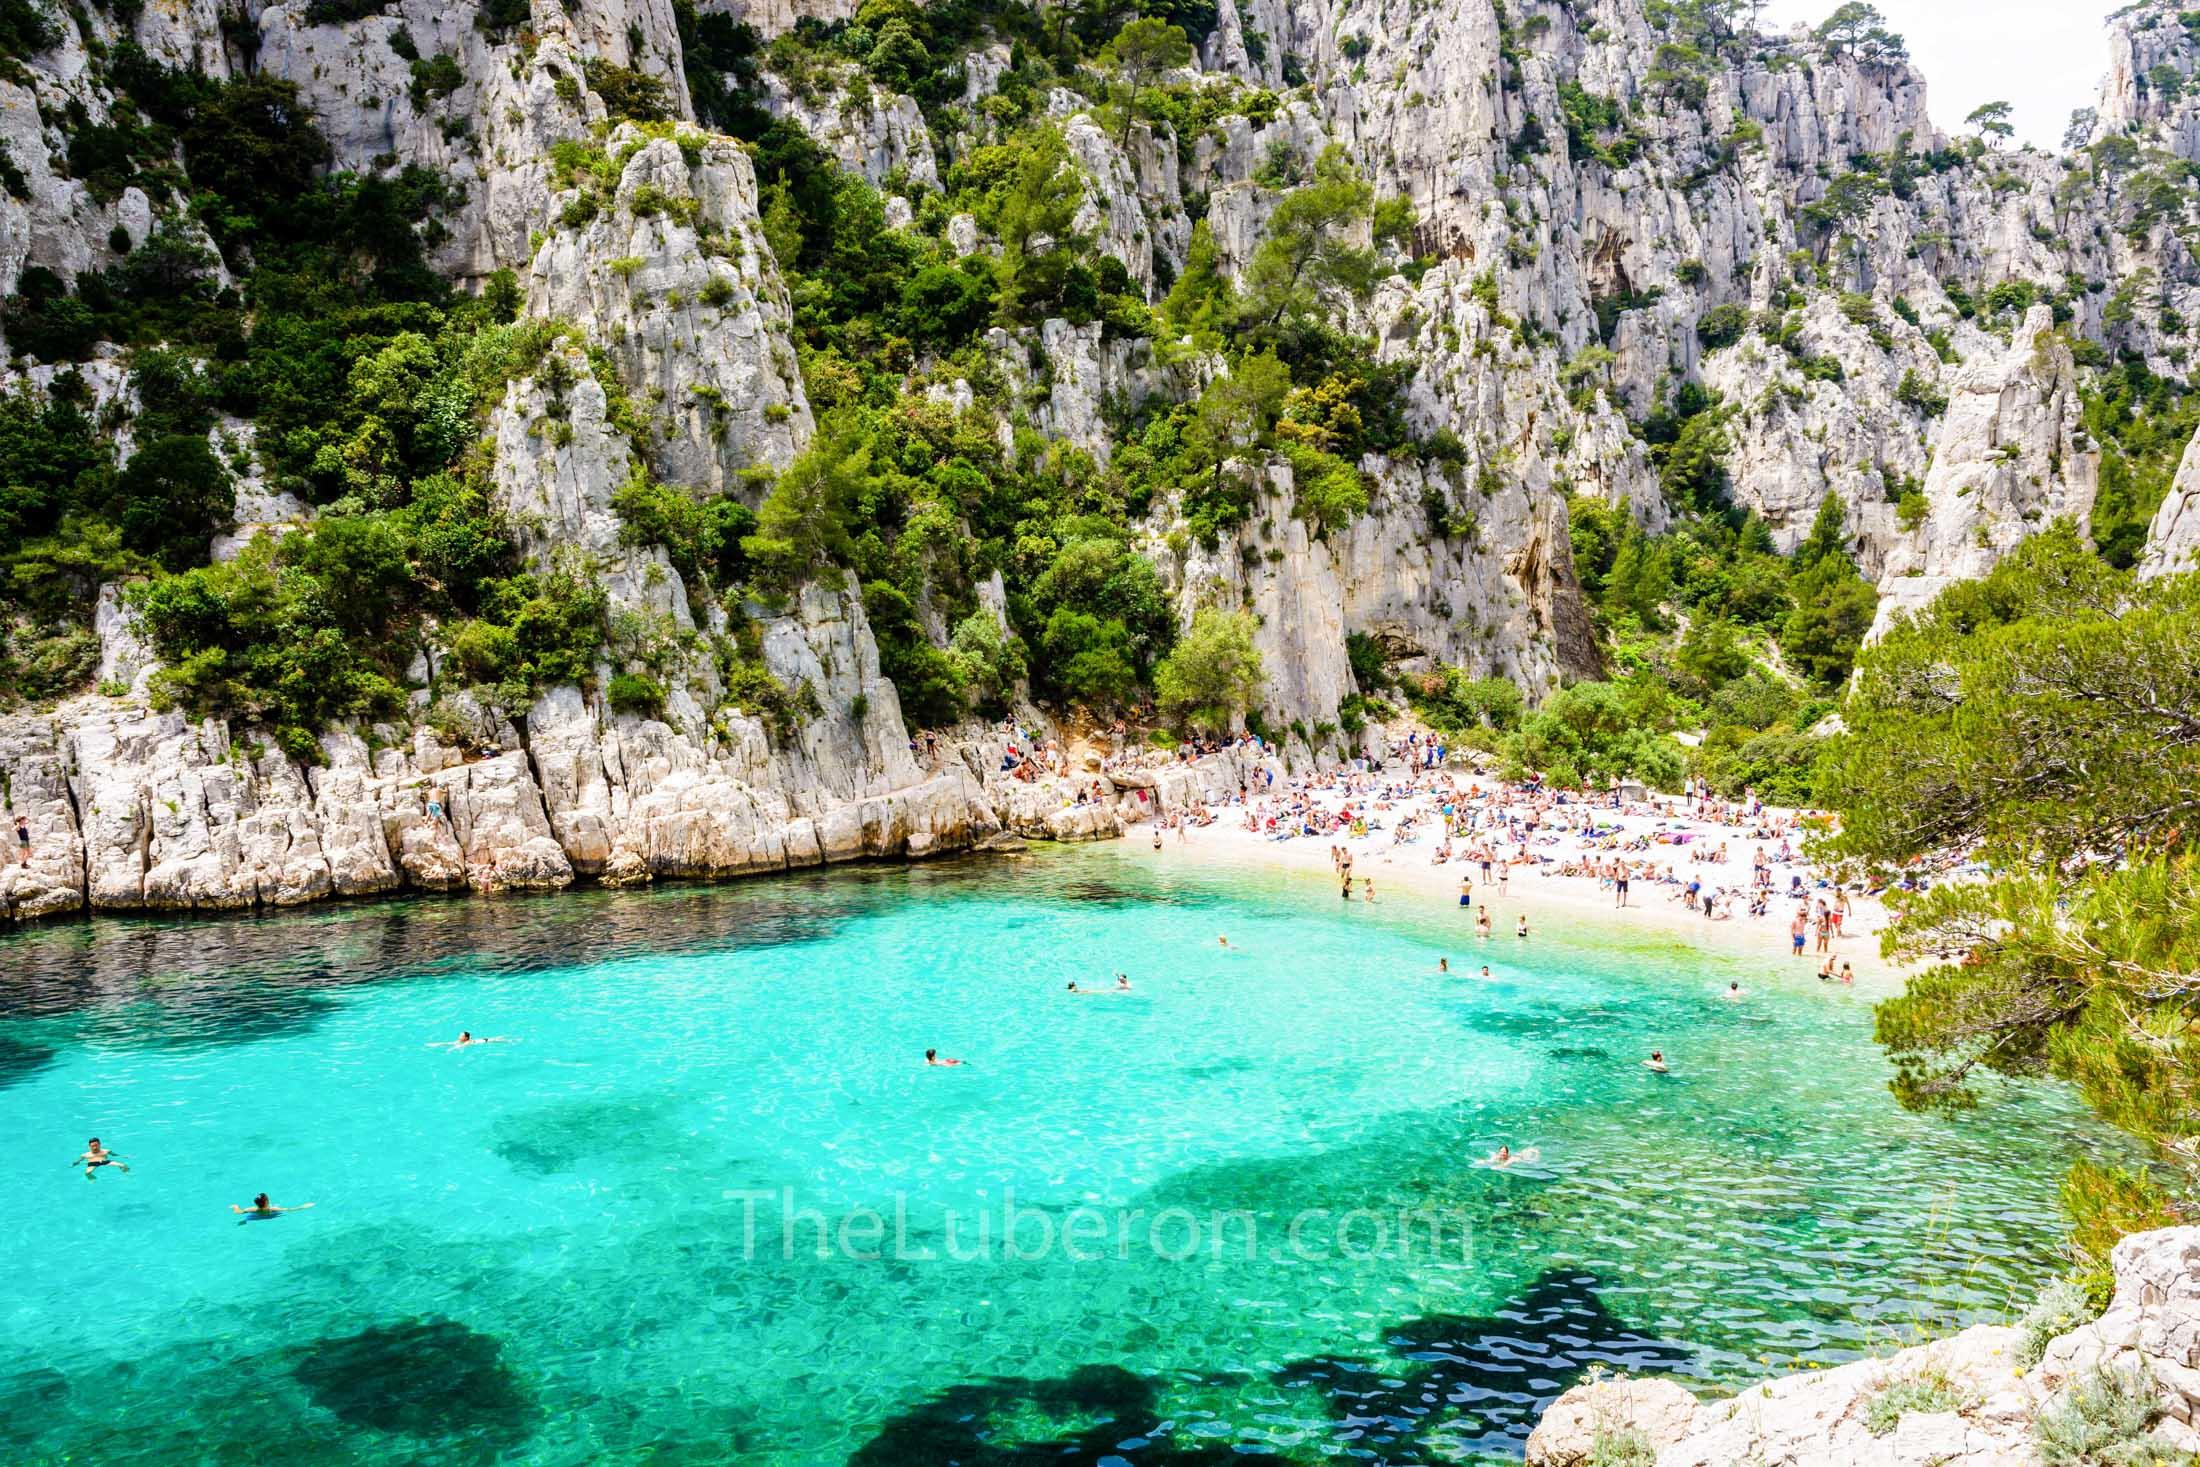 Calanque d'En-Vau beach scene